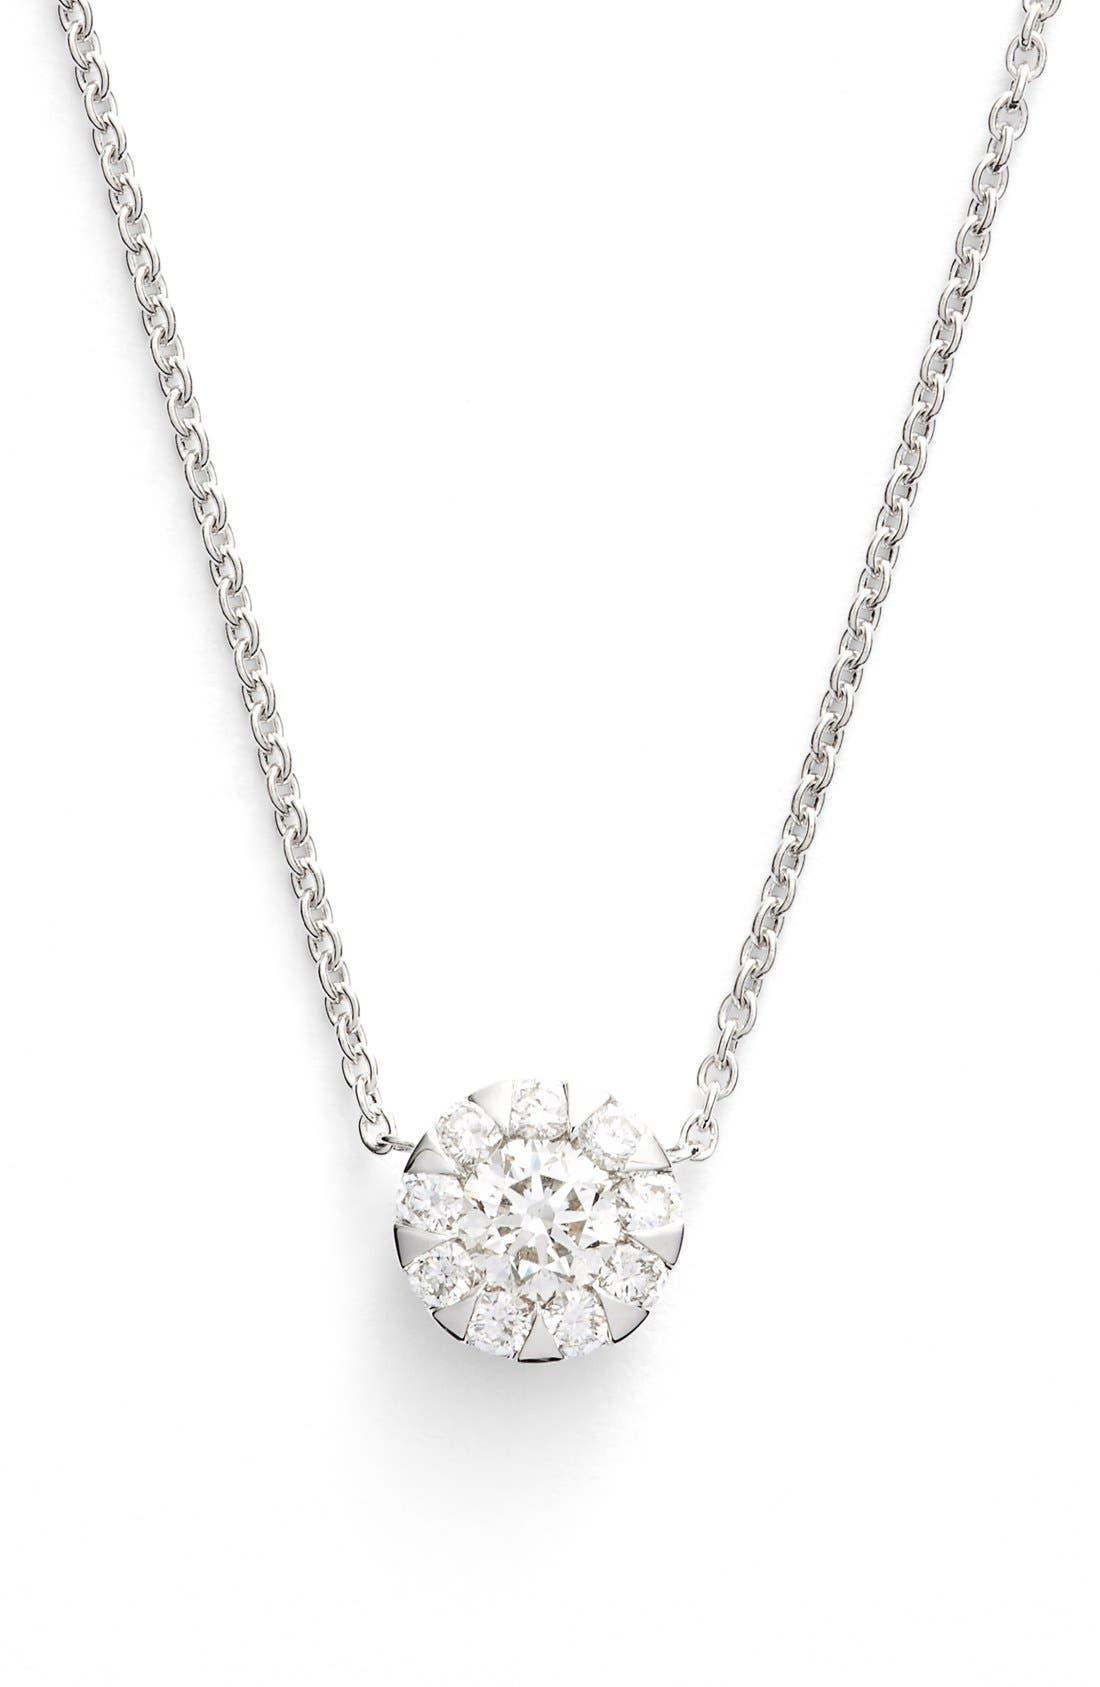 Main Image - Kwiat 'Sunburst' Diamond Pendant Necklace